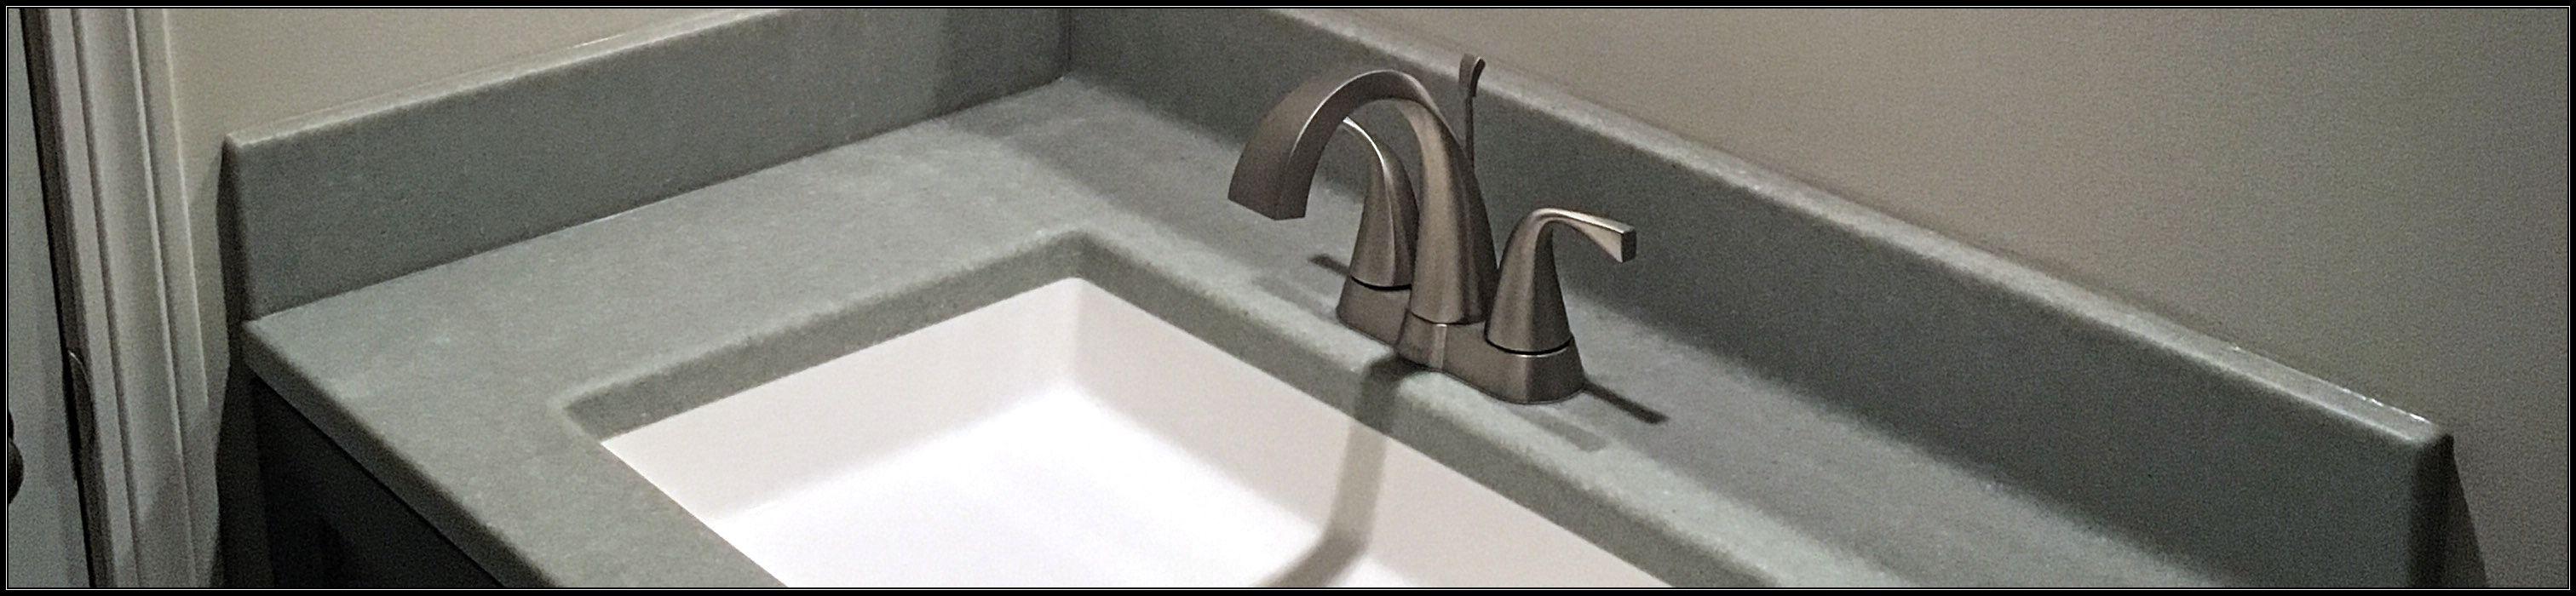 Bathroom Remodeling In Blaine MN Bathroom Company - Bathroom vanities twin cities